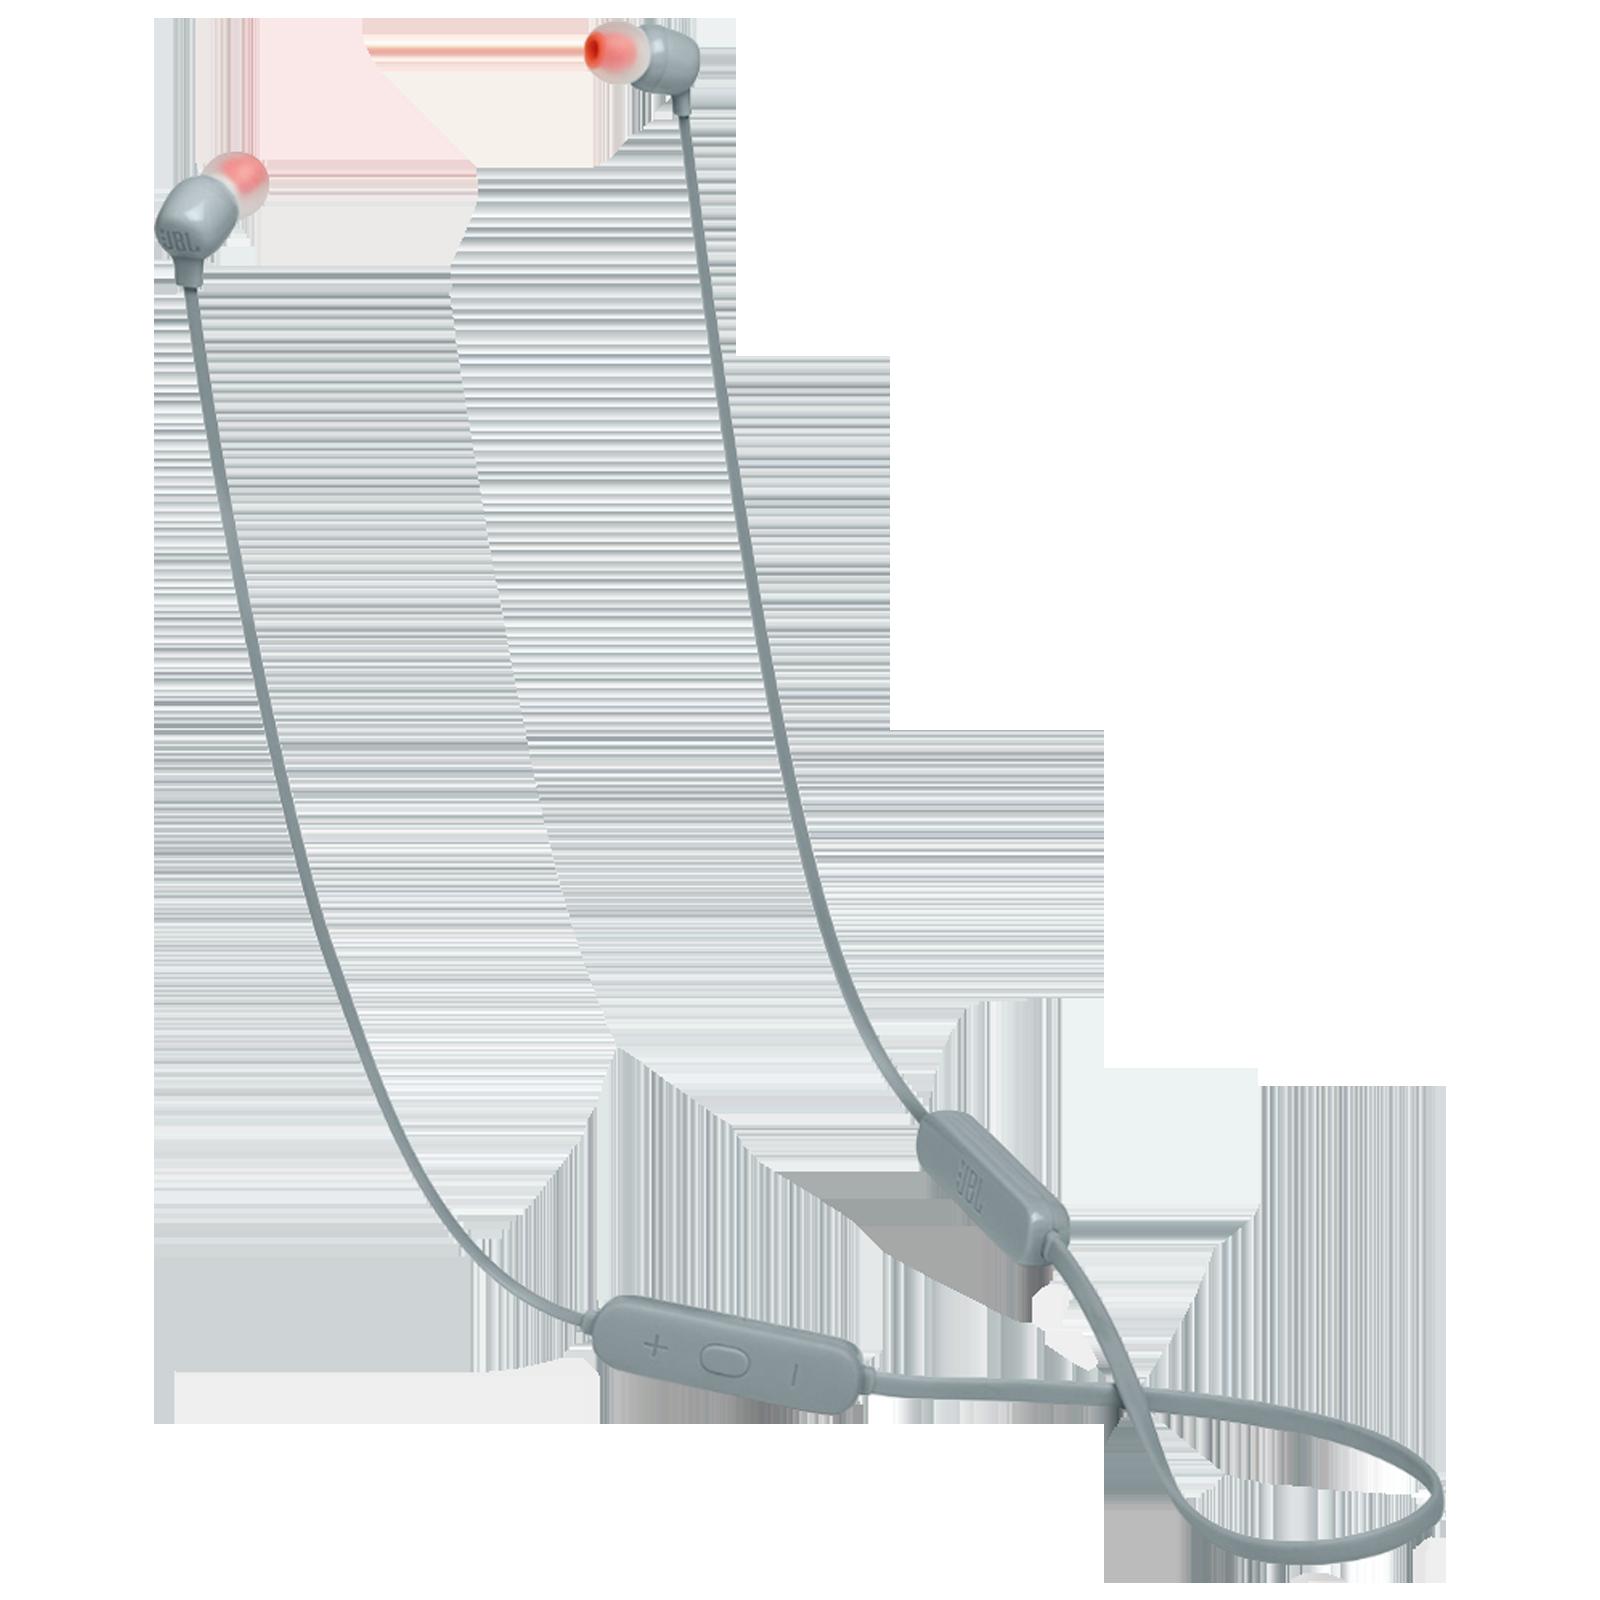 JBL Tune In-Ear Wireless Earphone with Mic (Bluetooth 4.2, JBL Pure Bass Sound, JBLT115BTGRY, Grey)_1